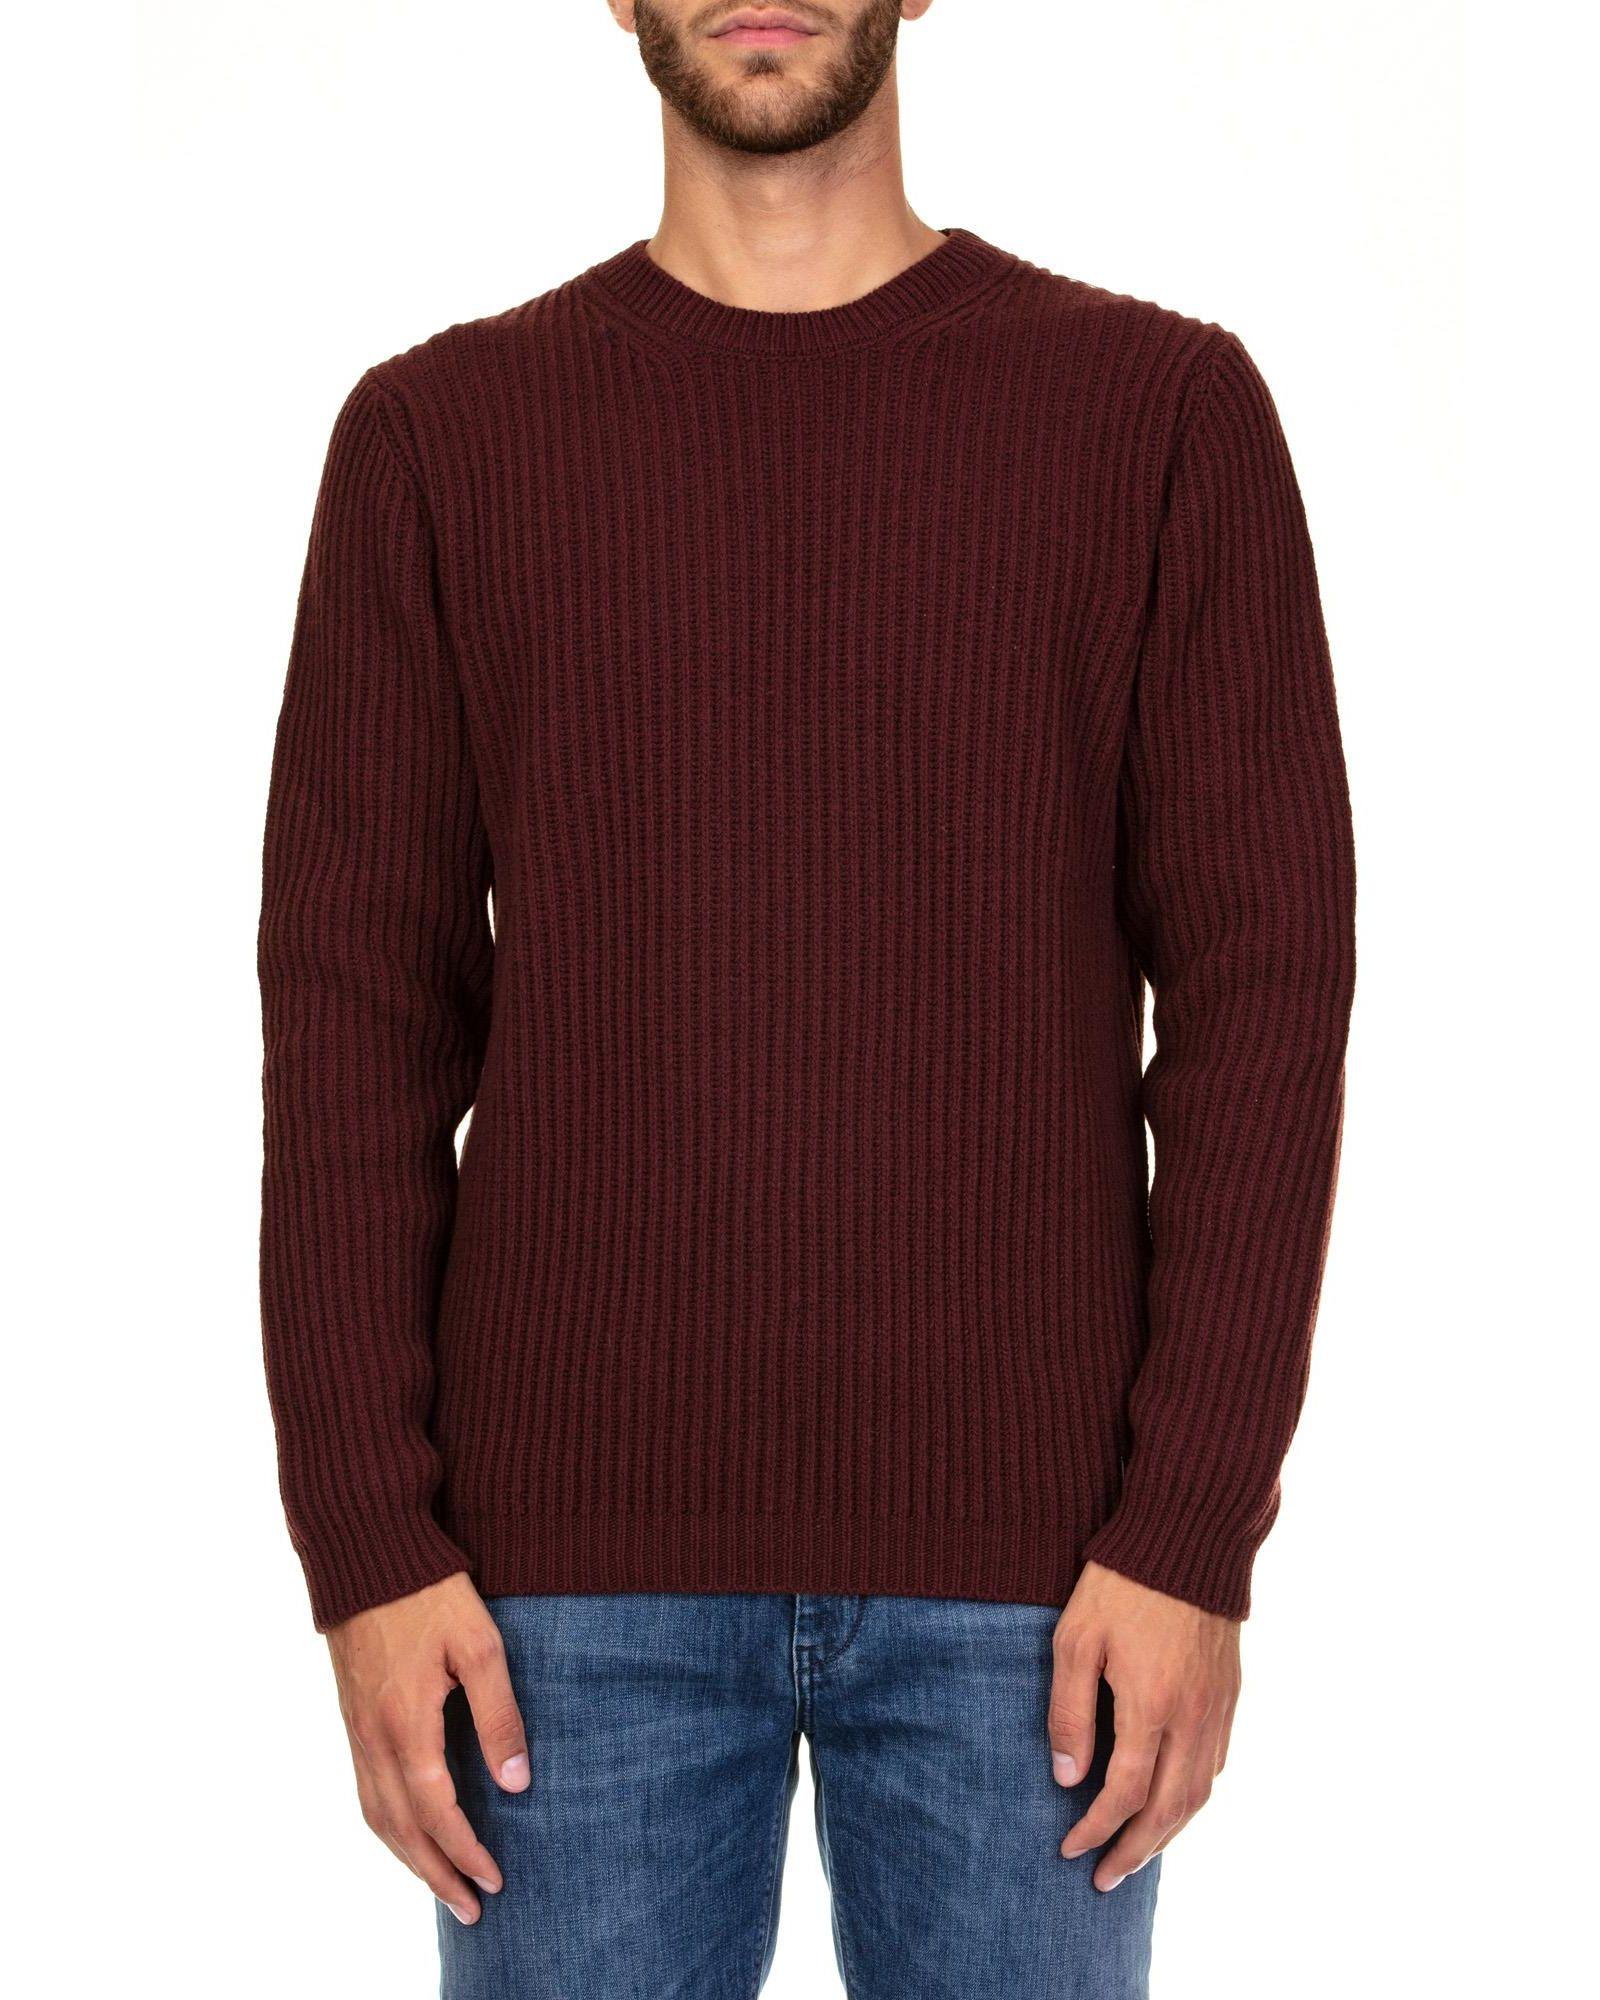 TRUSSARDI Wool Sweater in Burgundy